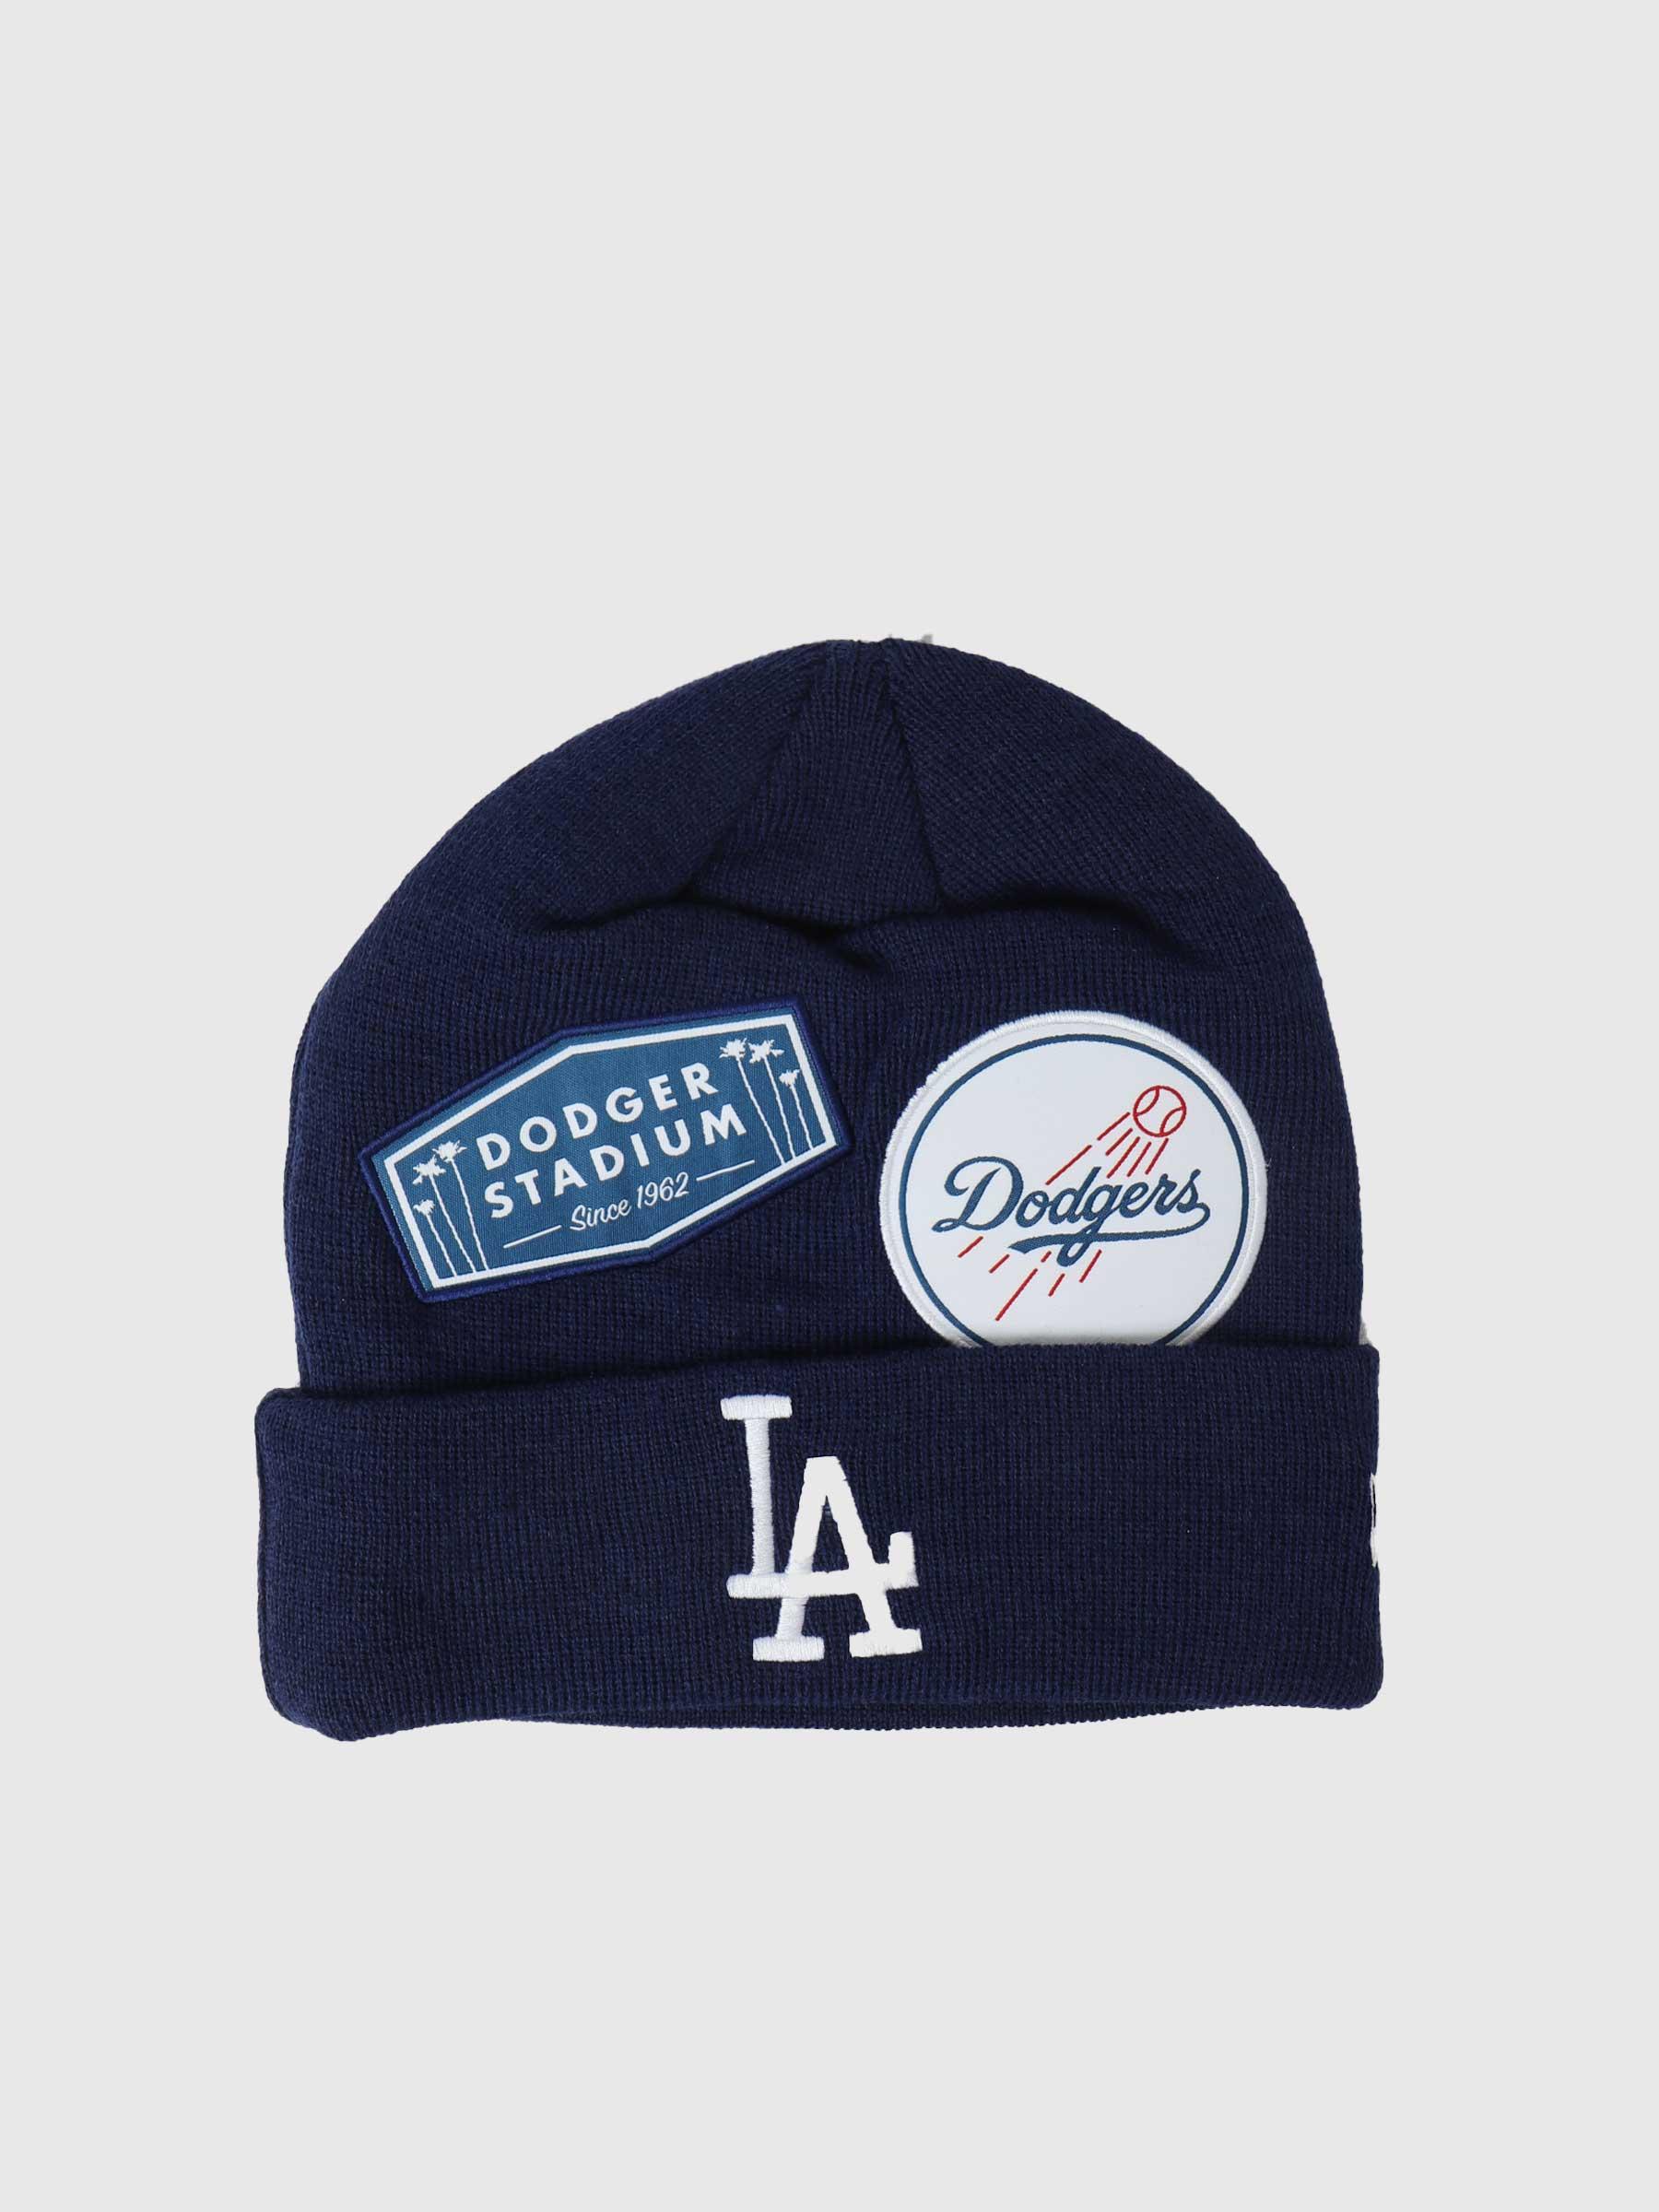 Multi Patch Beanie Los Angeles Dodgers NE60141462